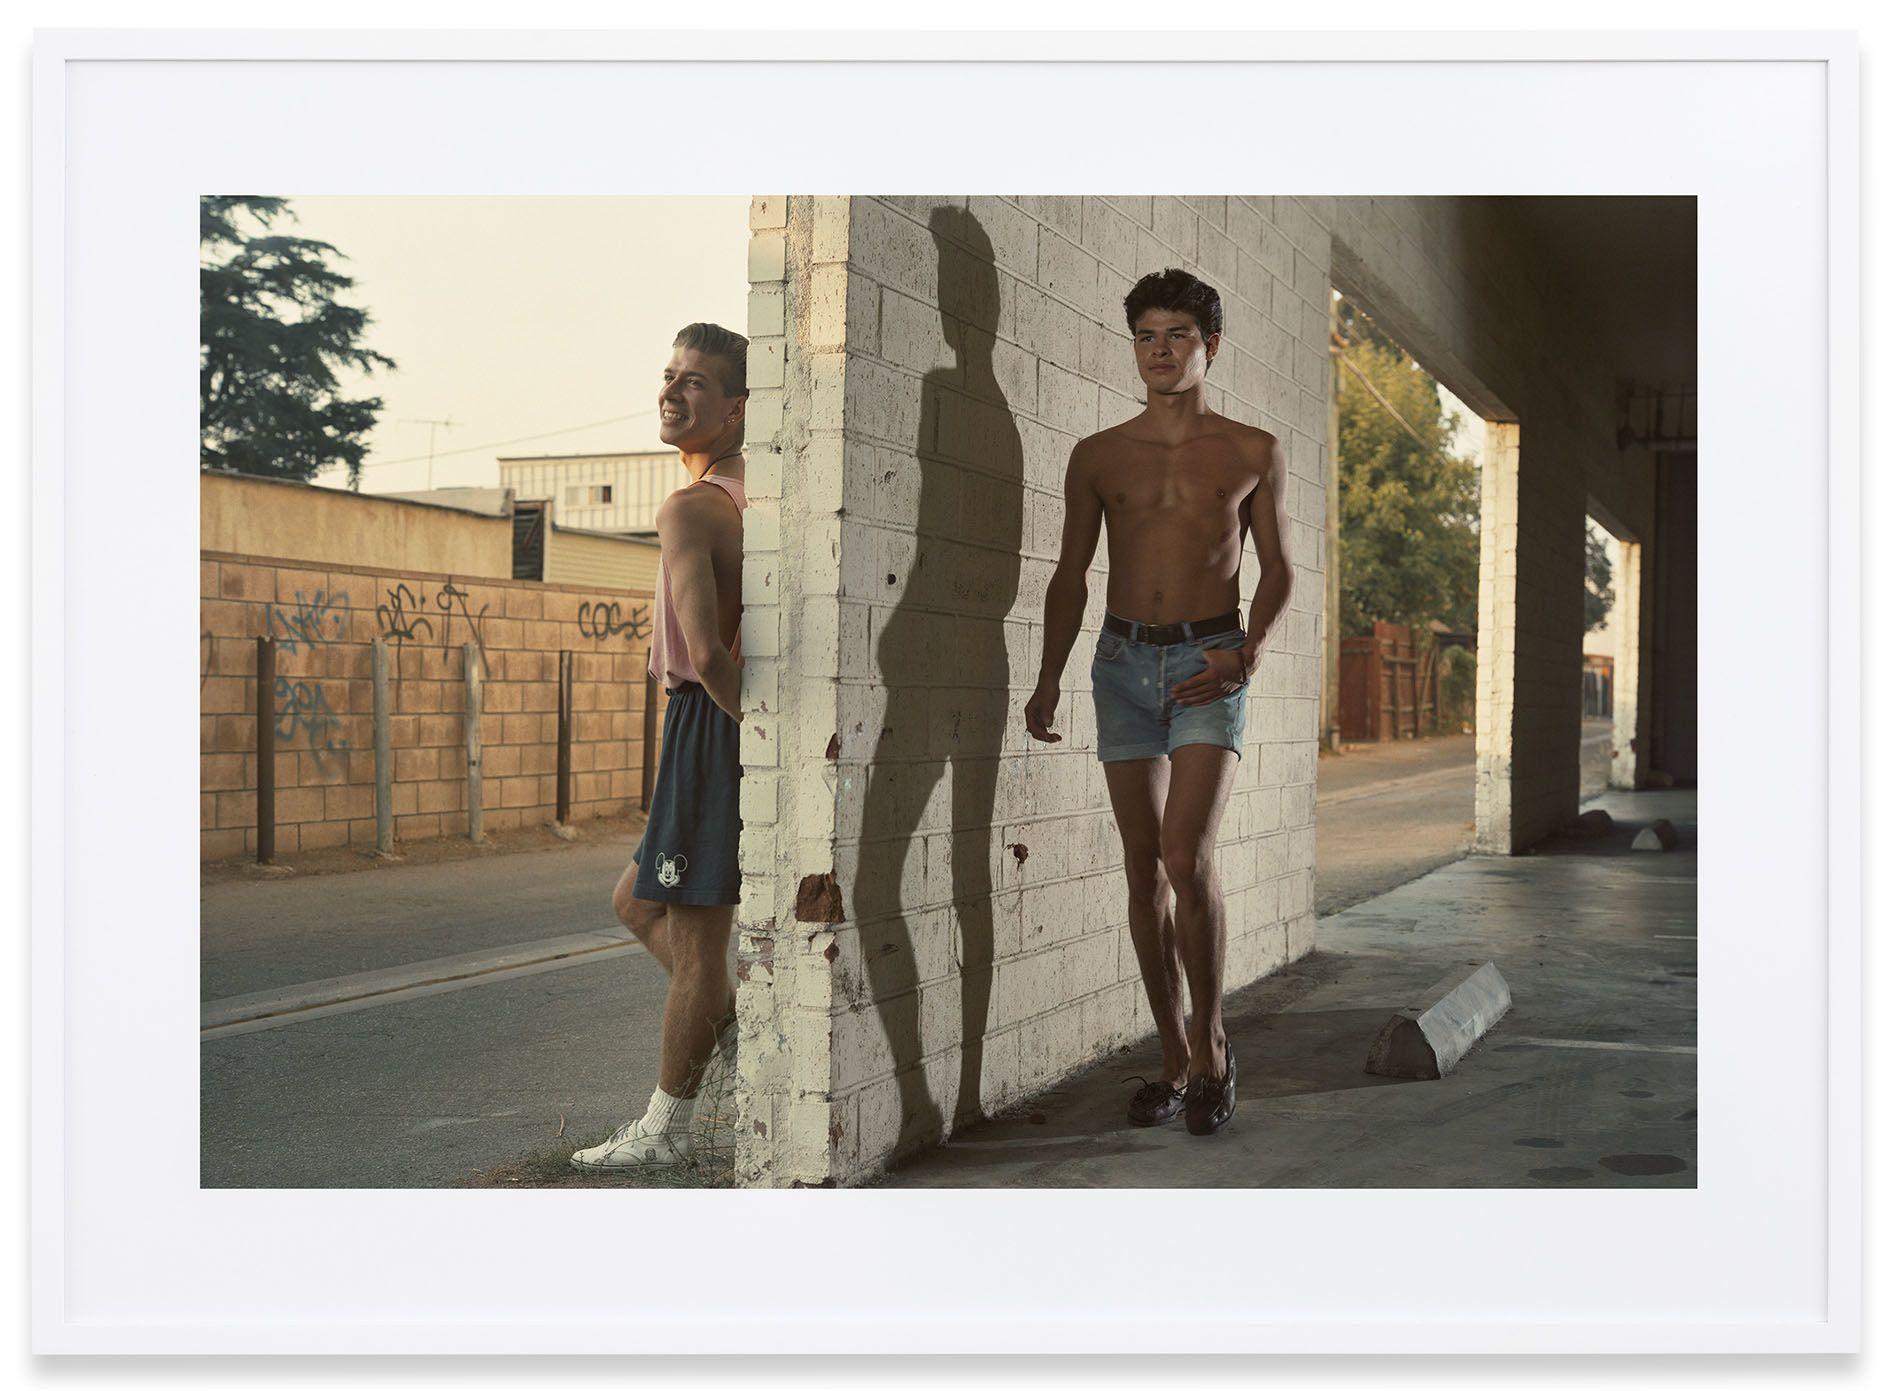 Philip-Lorca diCorcia – Hustlers – Berlin